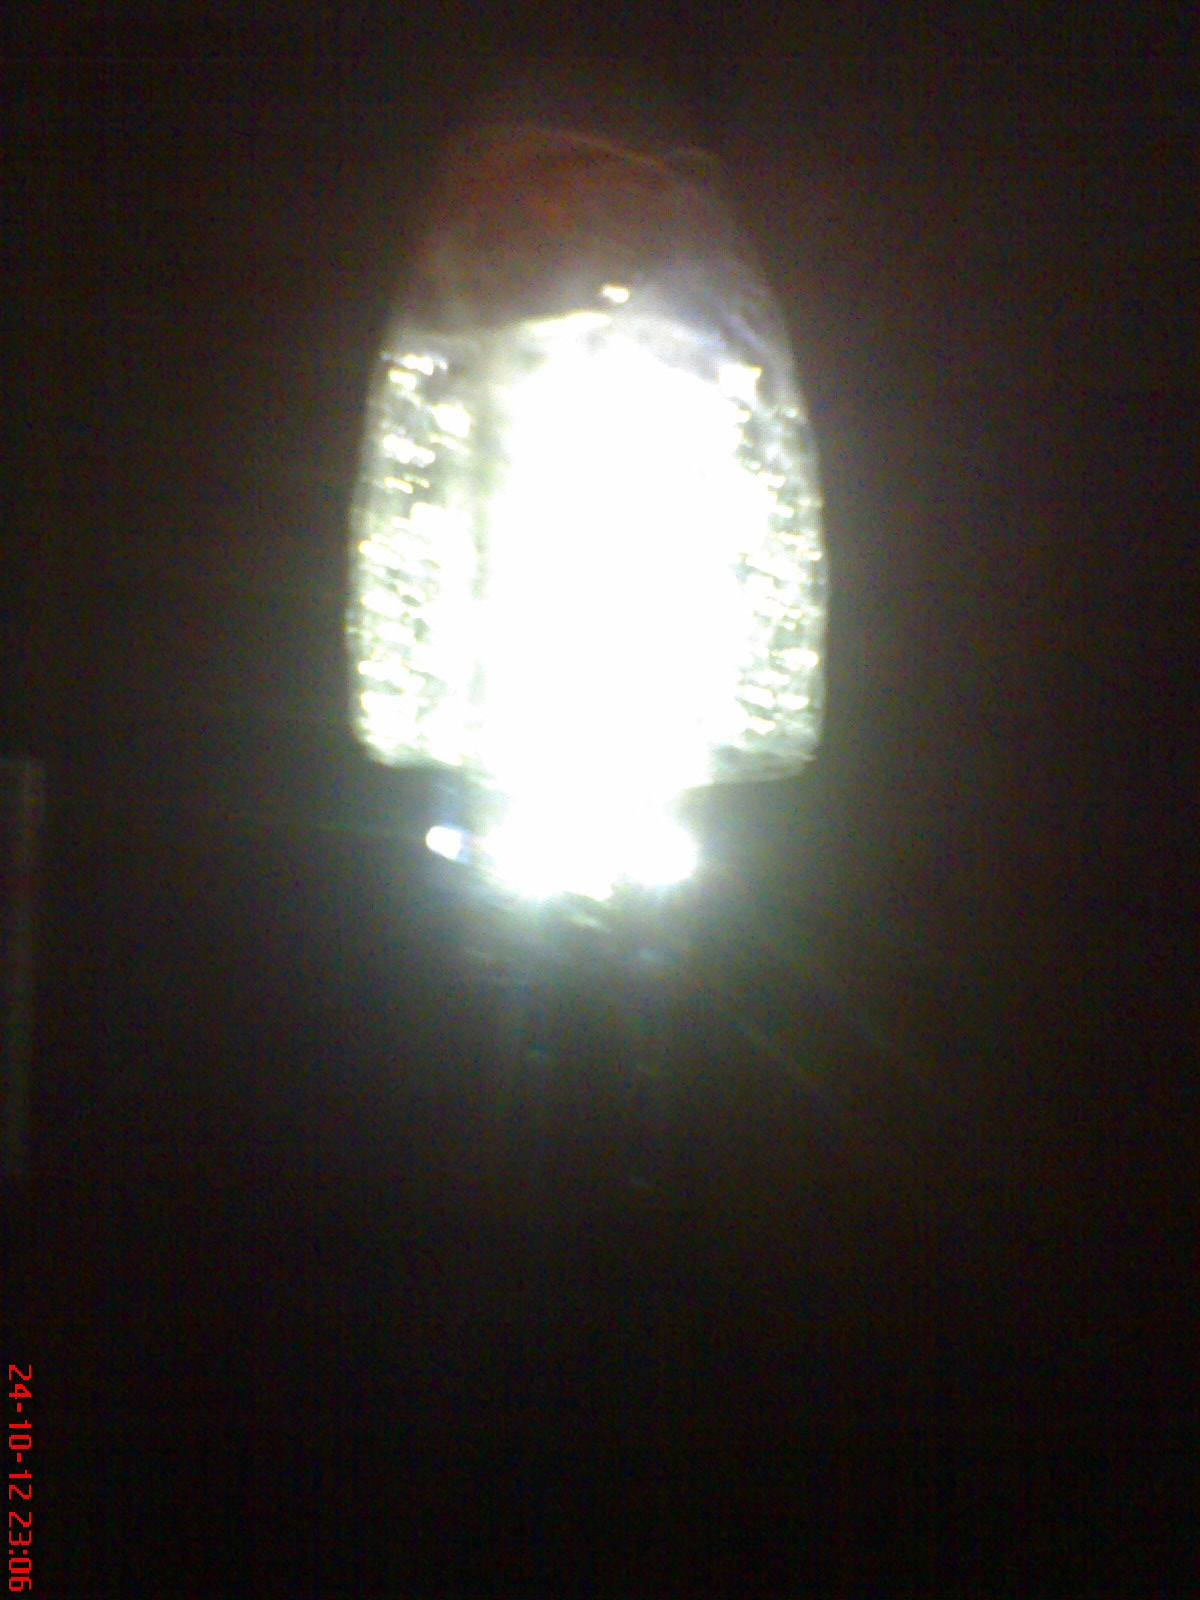 Lampu LED dengan sumber AC yang Hemat Energi dan Memanfaatkan Barang ...